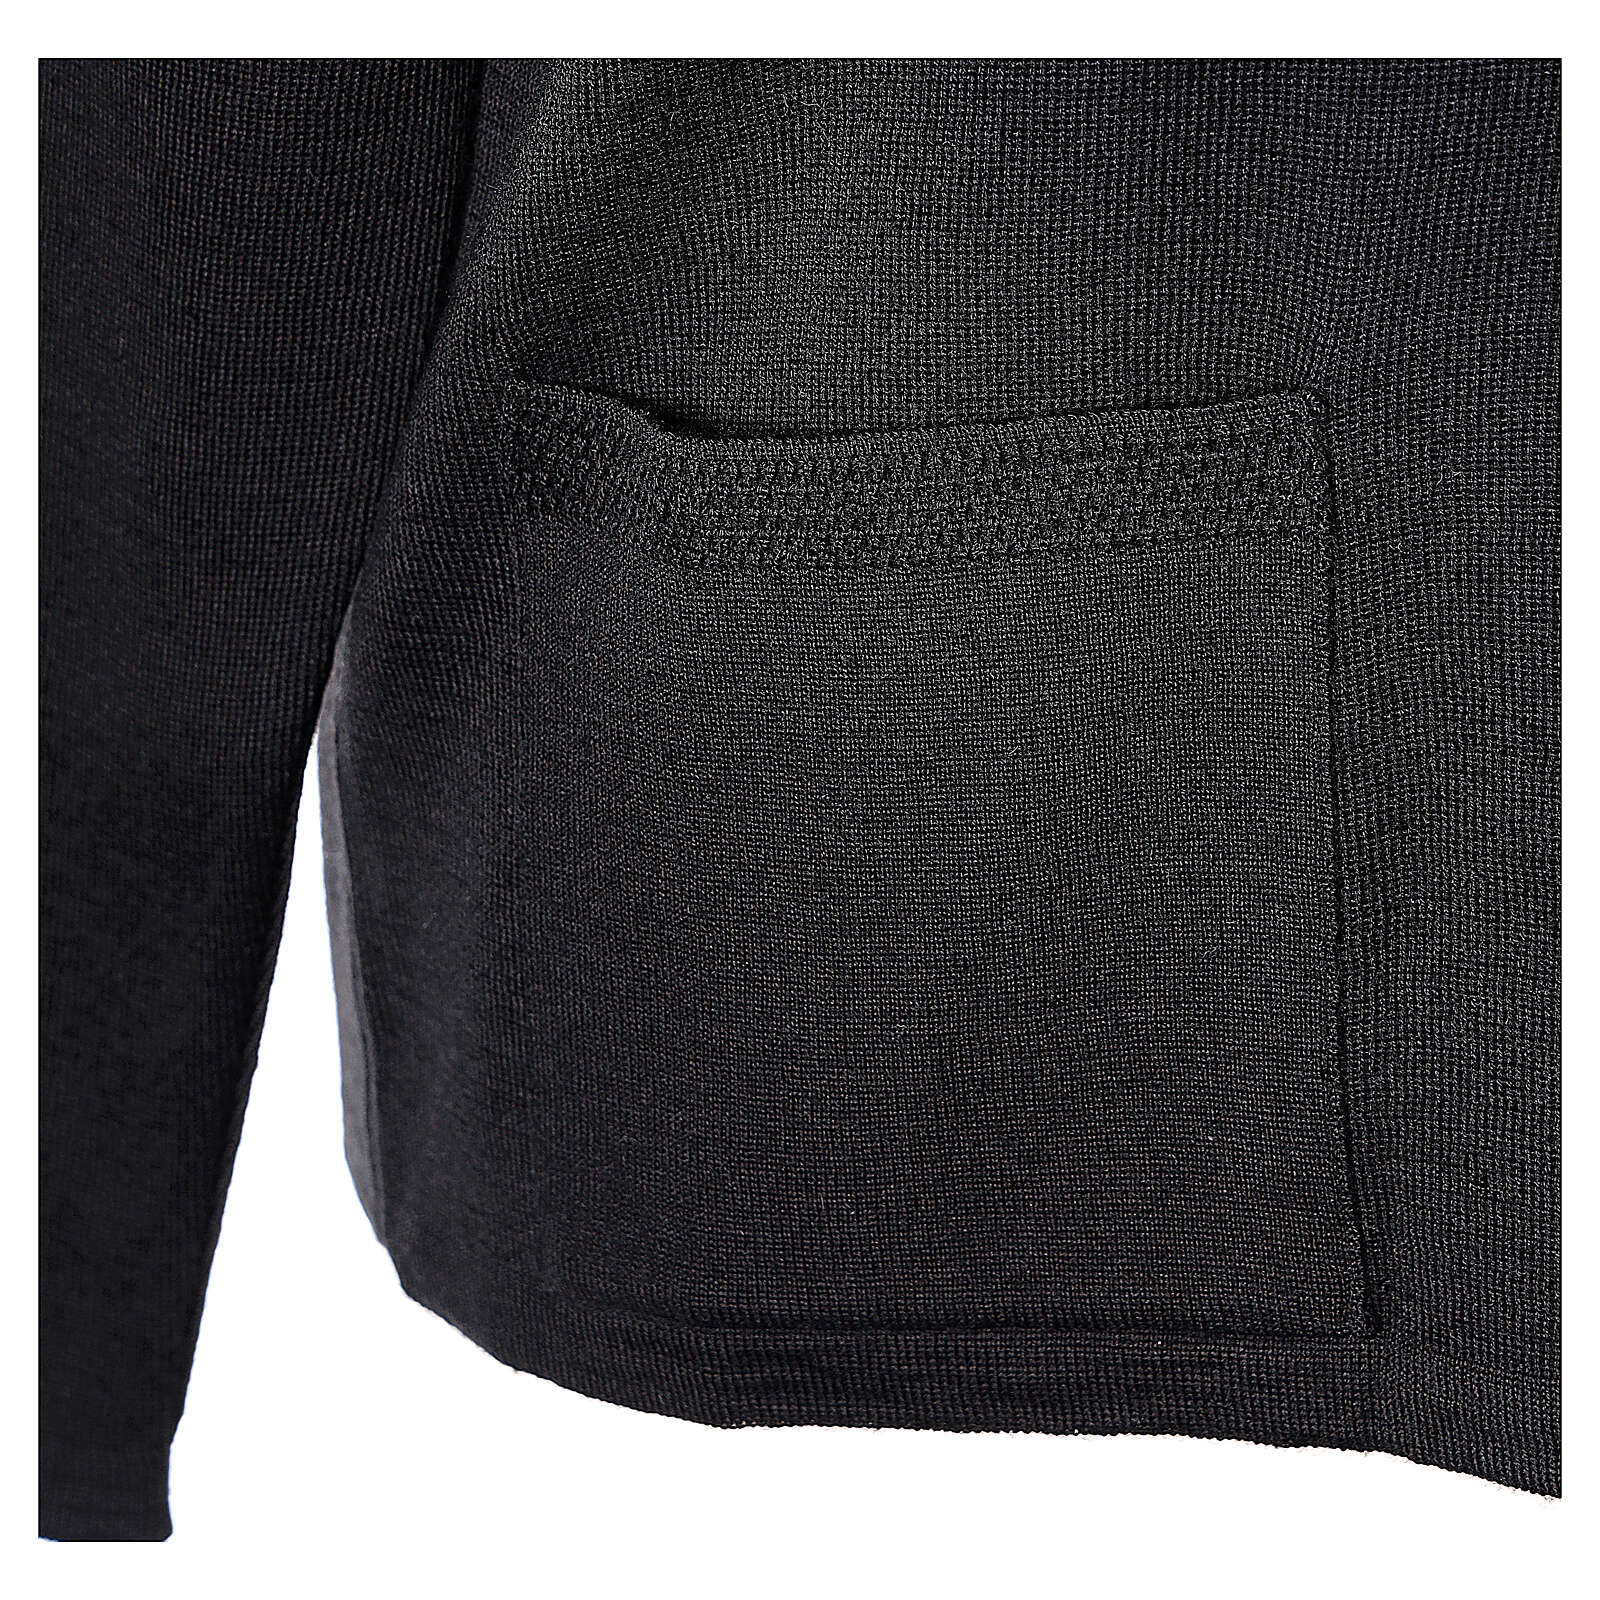 Cardigan pour soeur noir col en V poches GRANDE TAILLE 50% acrylique 50% mérinos In Primis 4